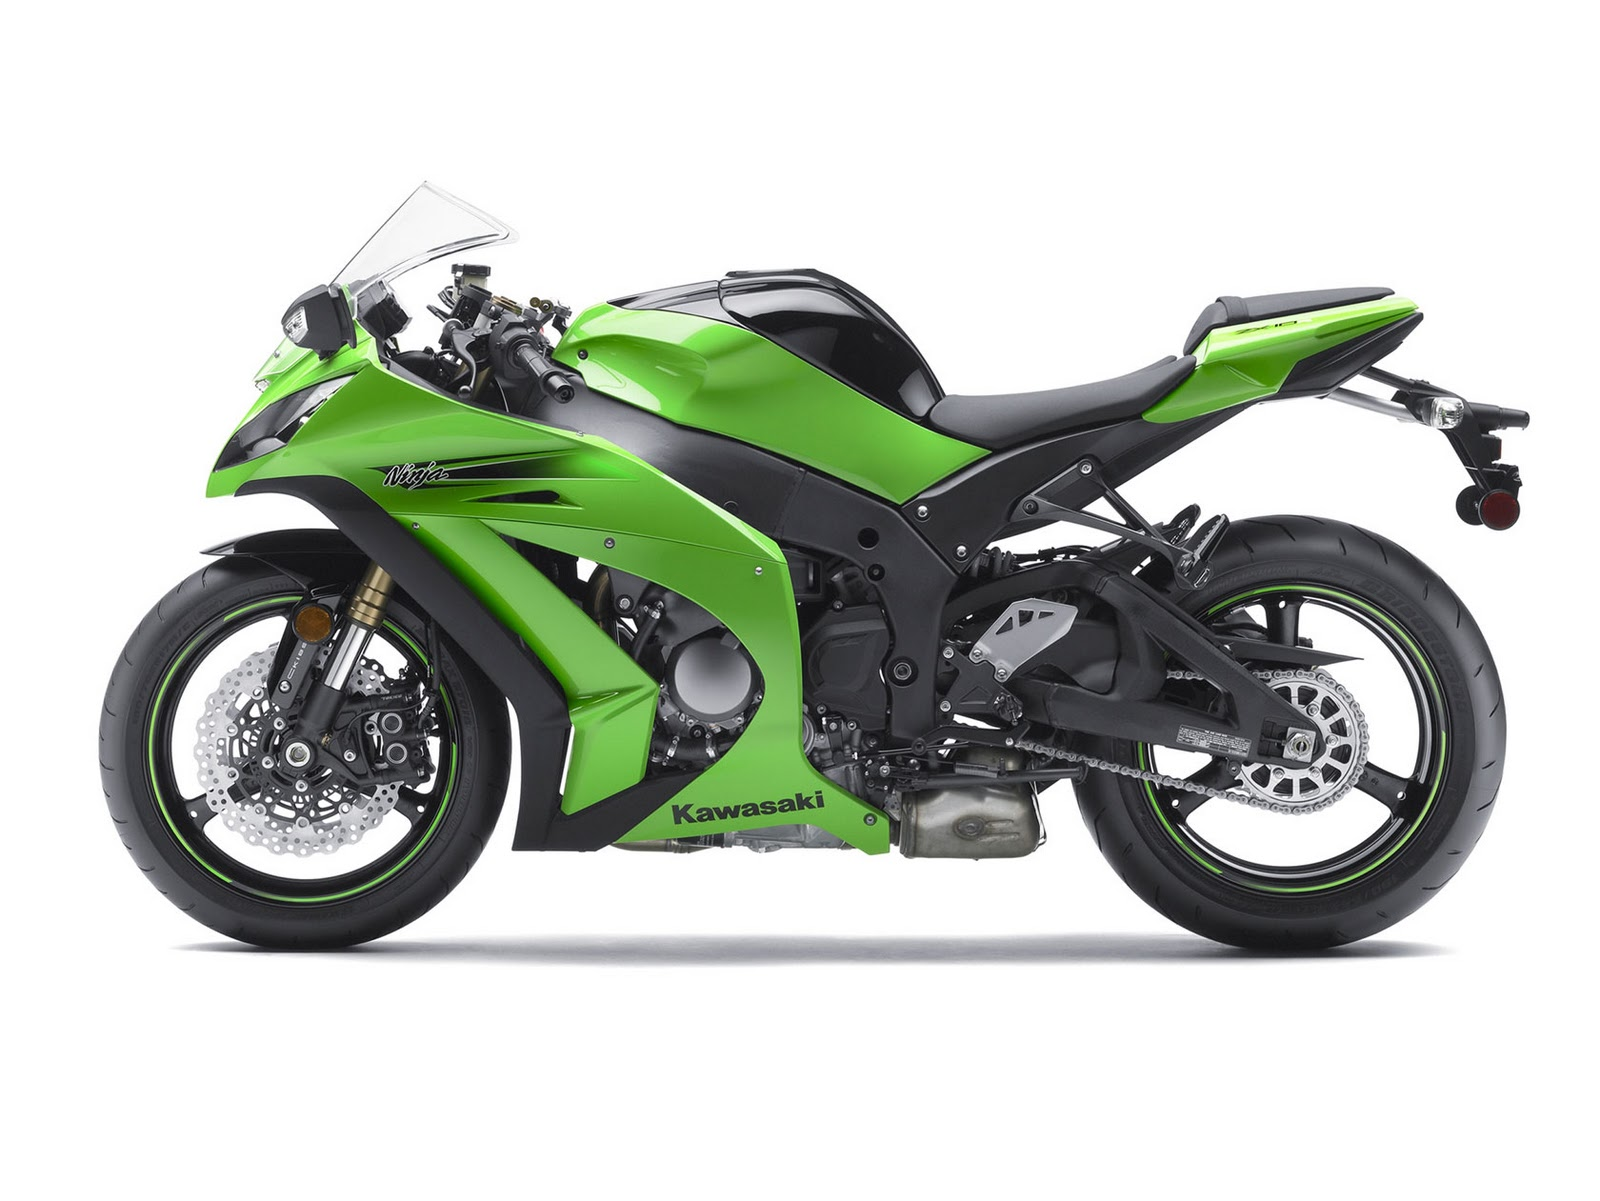 http://3.bp.blogspot.com/_1wPY9ZBcztY/TSrJDFwLg7I/AAAAAAAABVw/CvSy_Ysq31E/s1600/2011-Kawasaki-NinjaZX10RABS.jpg